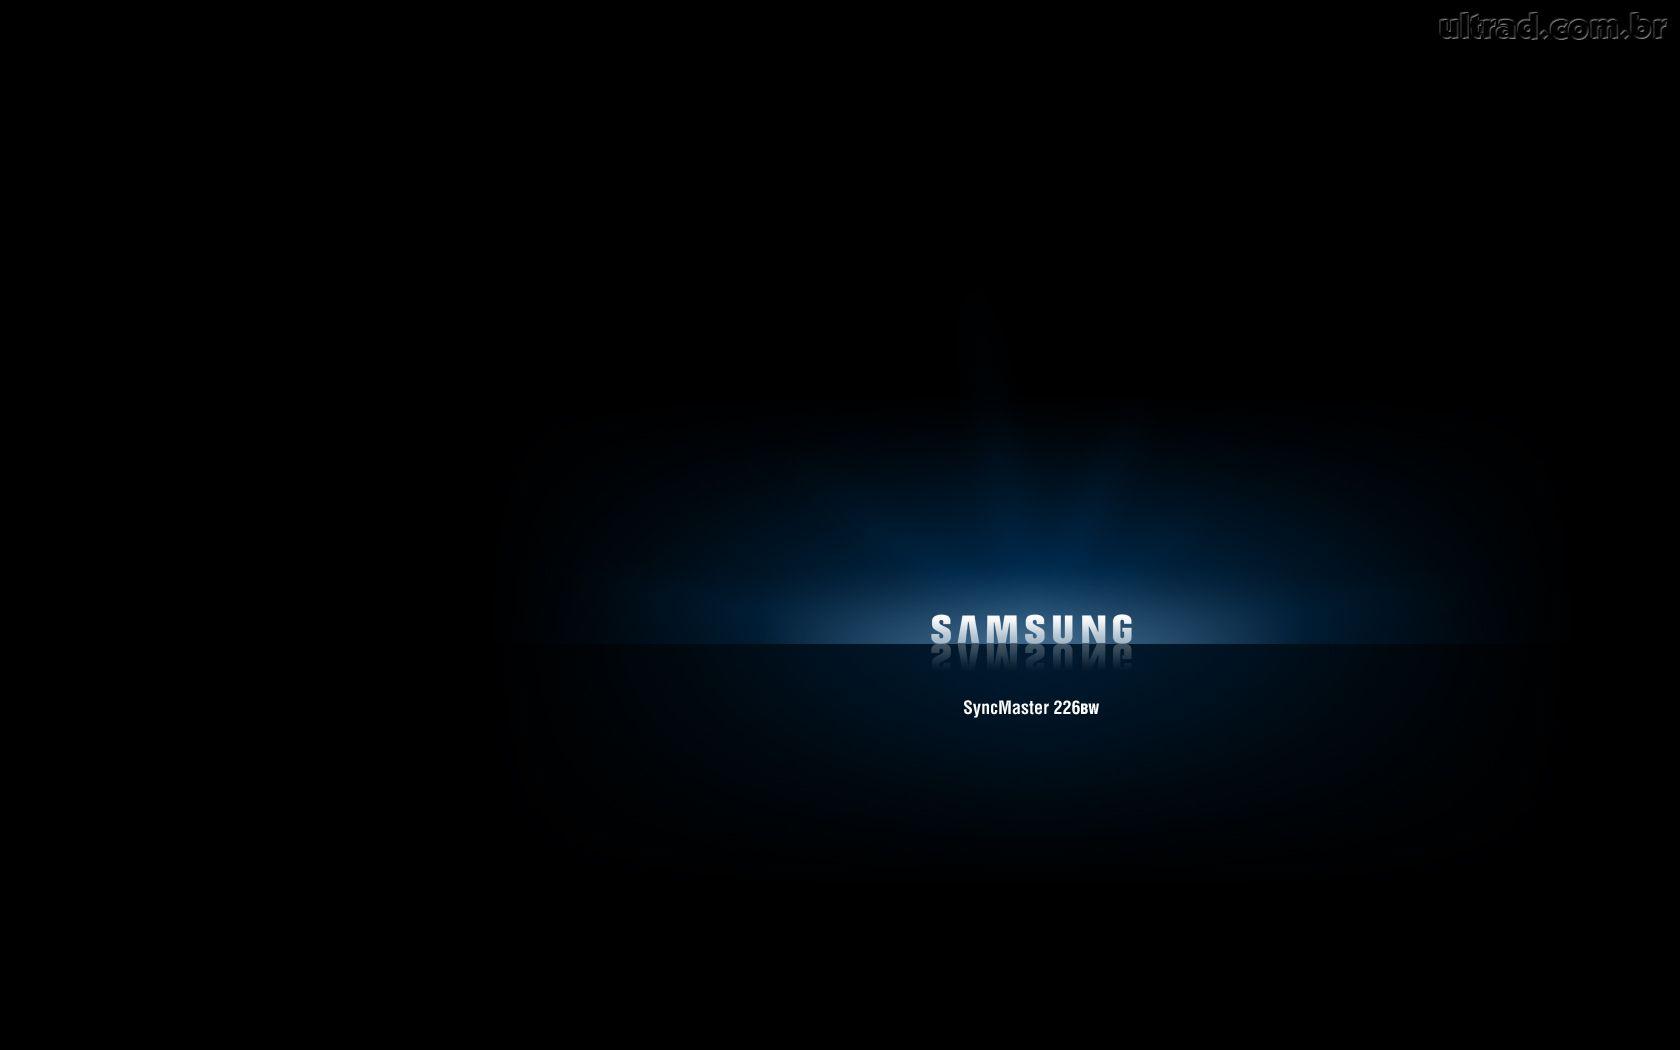 39 Samsung Hd Wallpaper On Wallpapersafari